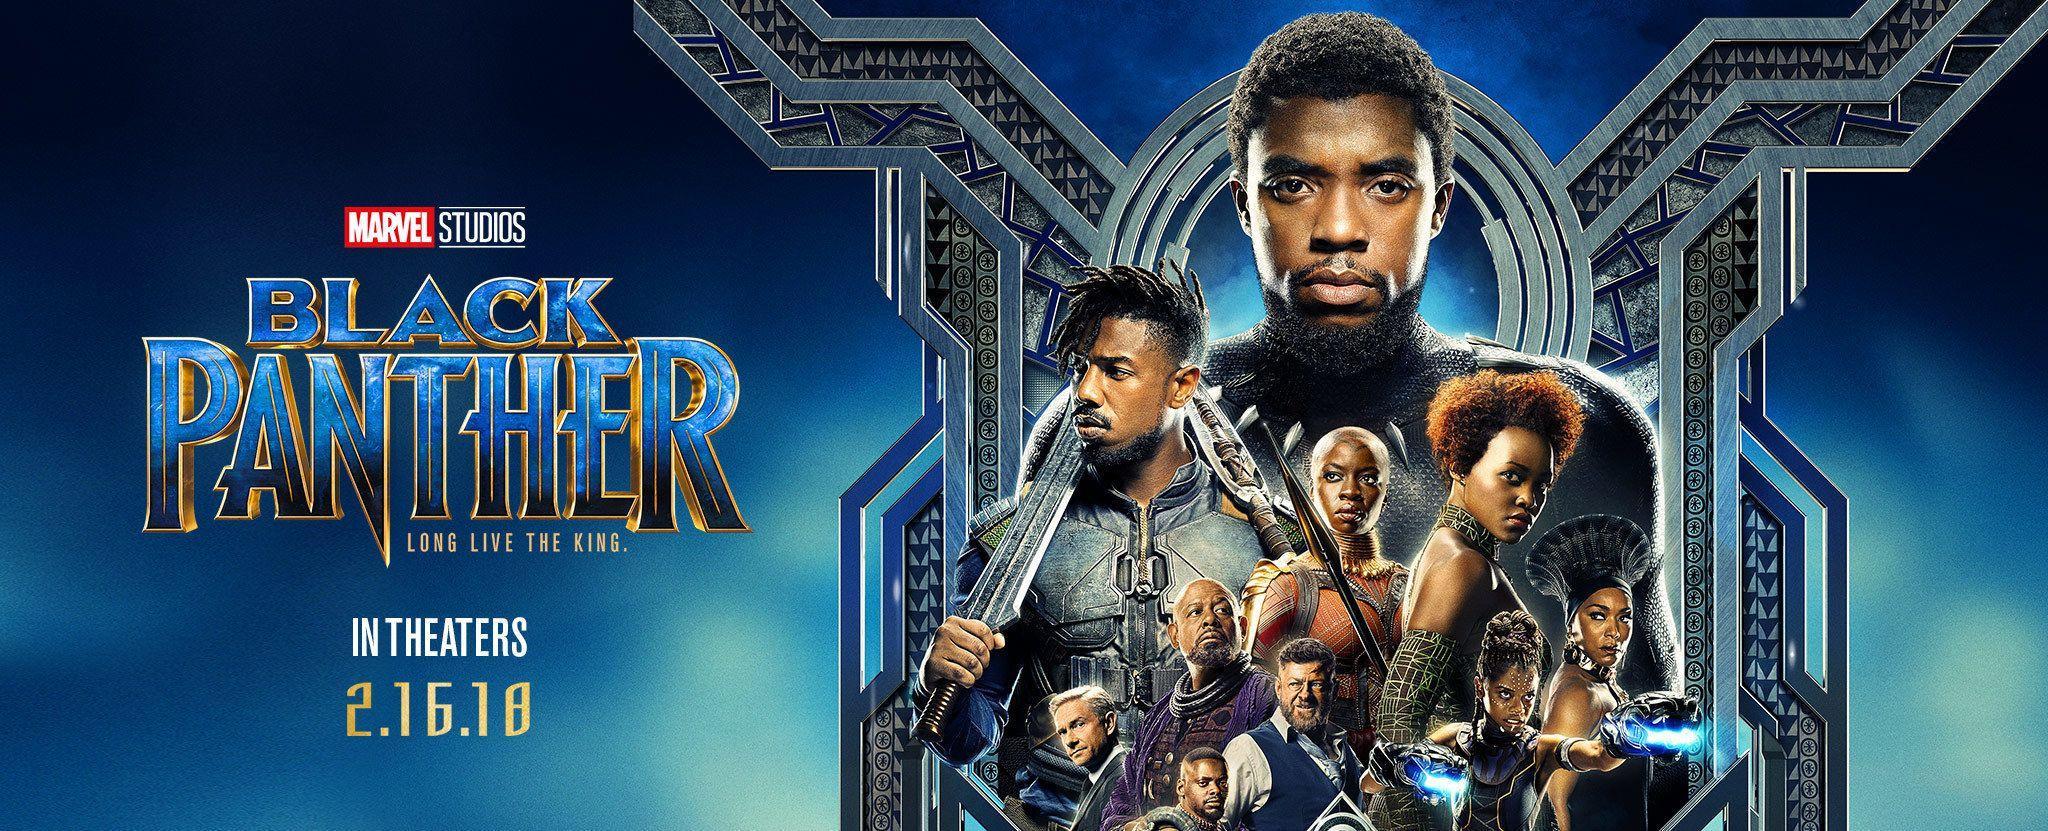 Black Panther 2018 Movie Wallpapers Top Free Black Panther 2018 Movie Backgrounds Wallpaperaccess